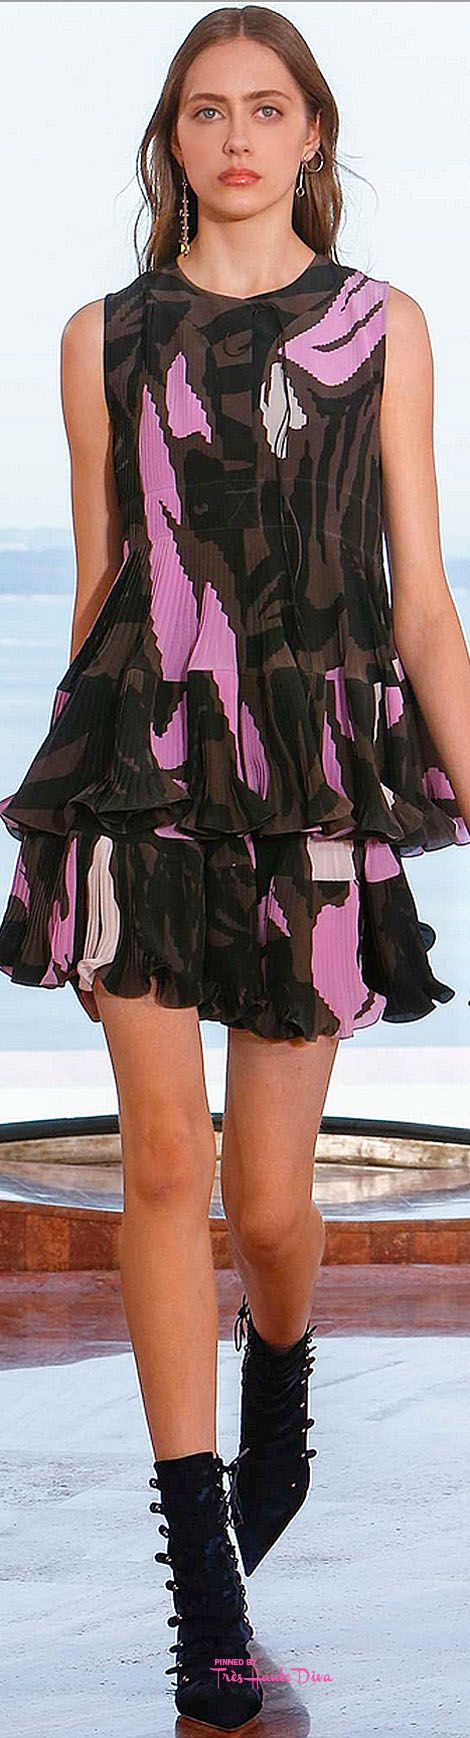 Christian Dior Resort 16: camo & pink dress.